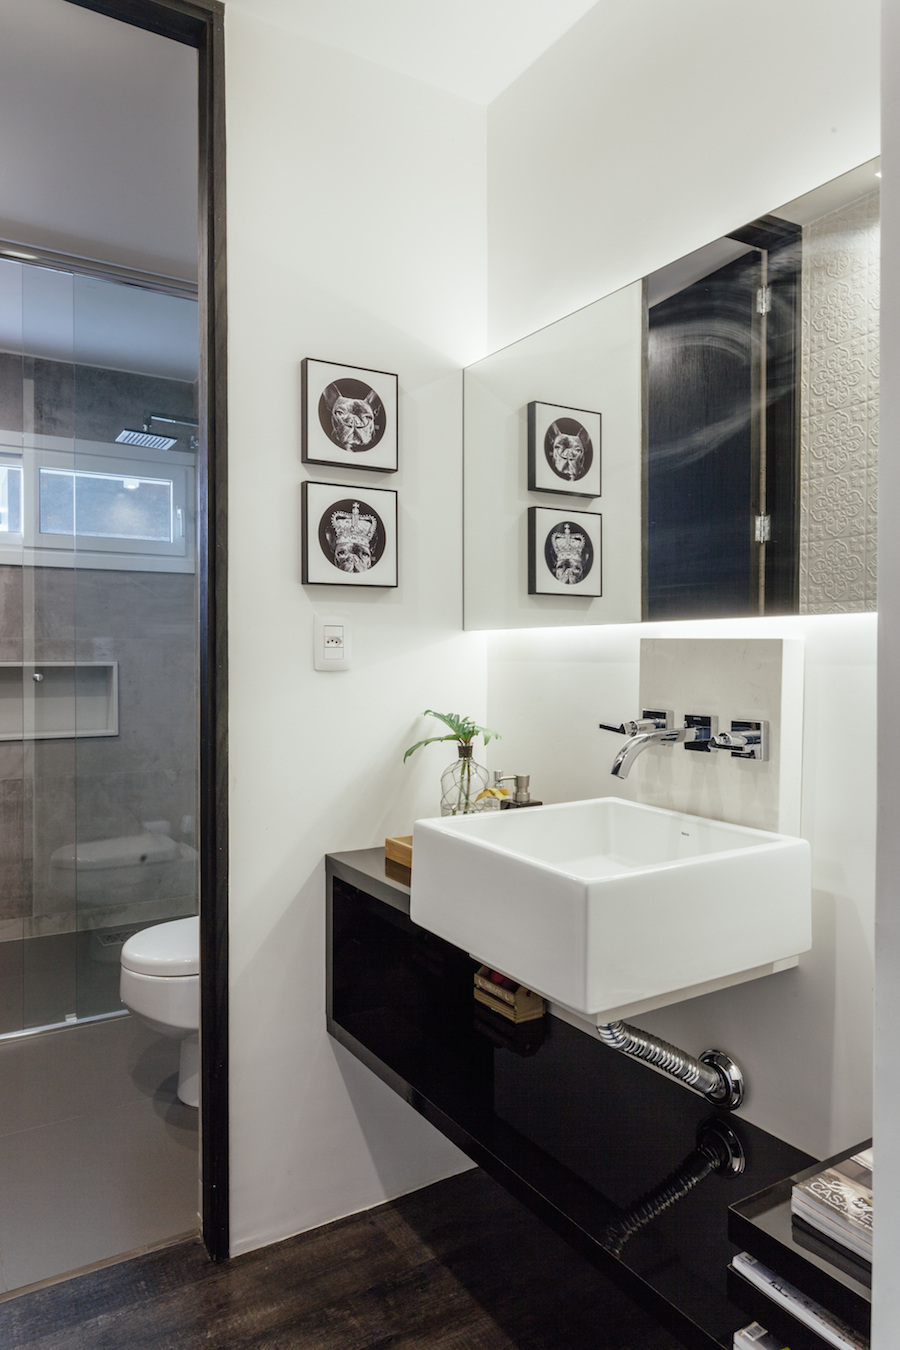 Casa ID House - Cadi Arquitetura20.jpg